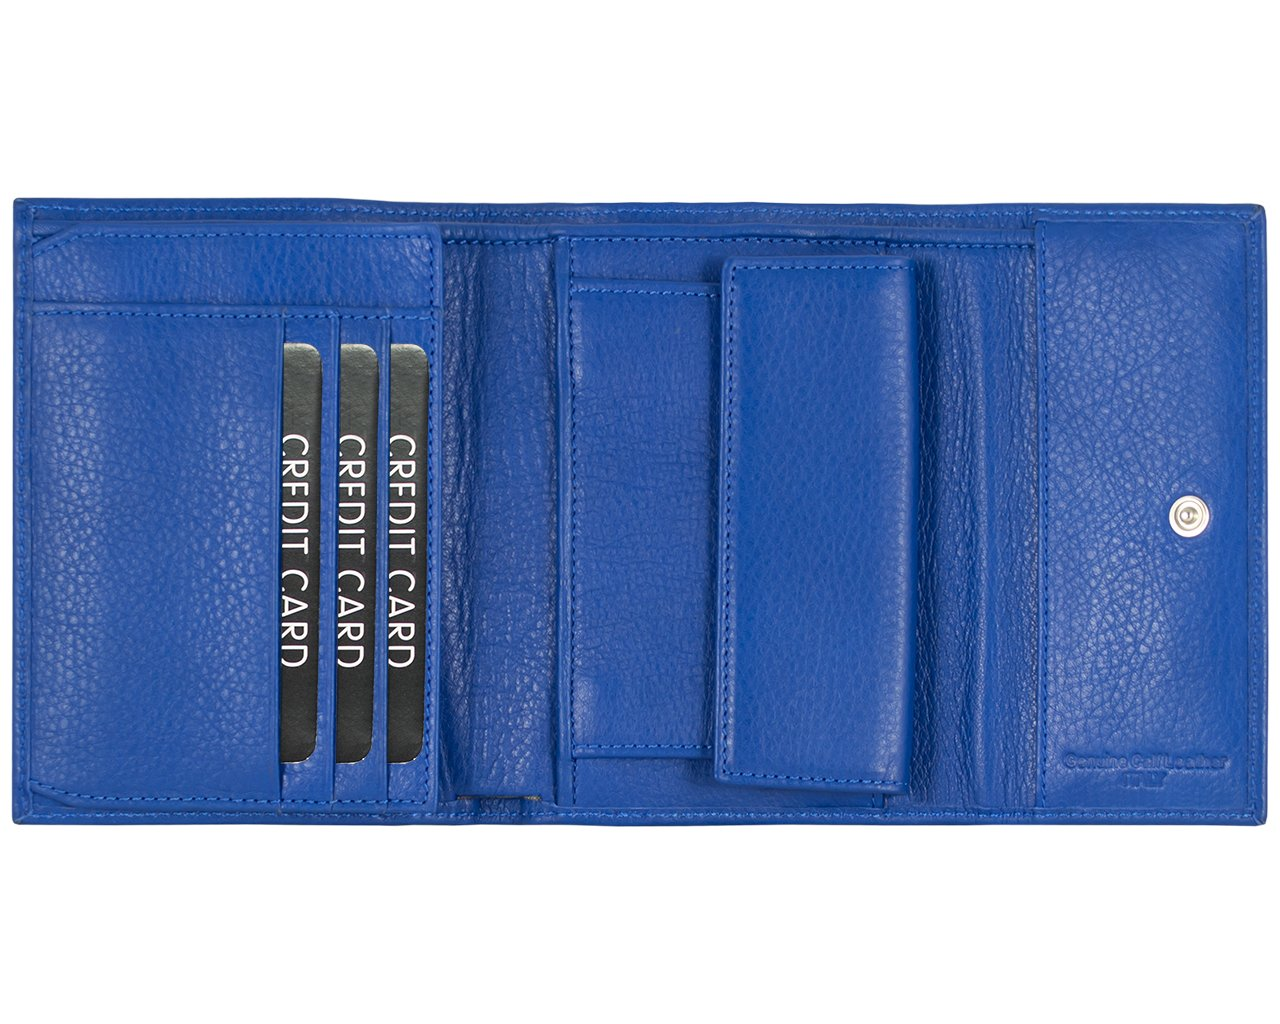 Giulio Barca Cartera, azul (bluette) (Azul) - 939-PALMA ...